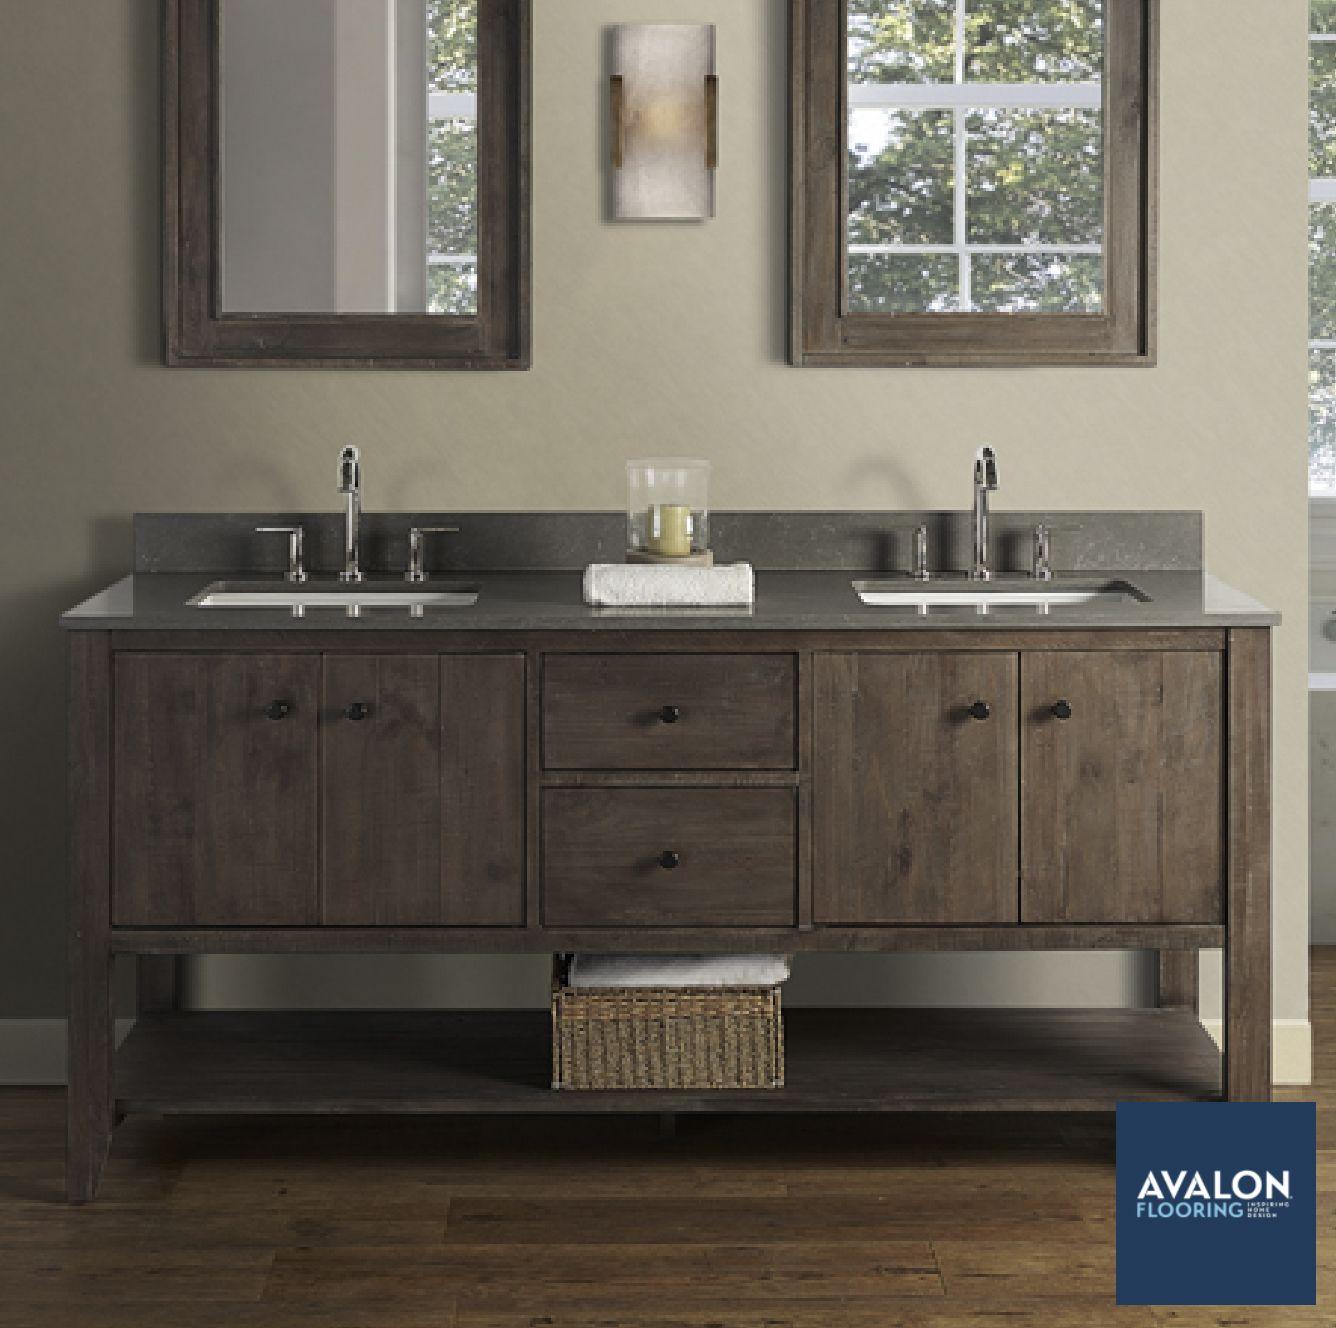 Bathroom Vanities Offer Convenient And Stylish Storage Space Vanities Bathroomvanity Bathroomvanities Homedesi Bathroom Vanity Store Bathroom Vanity Vanity